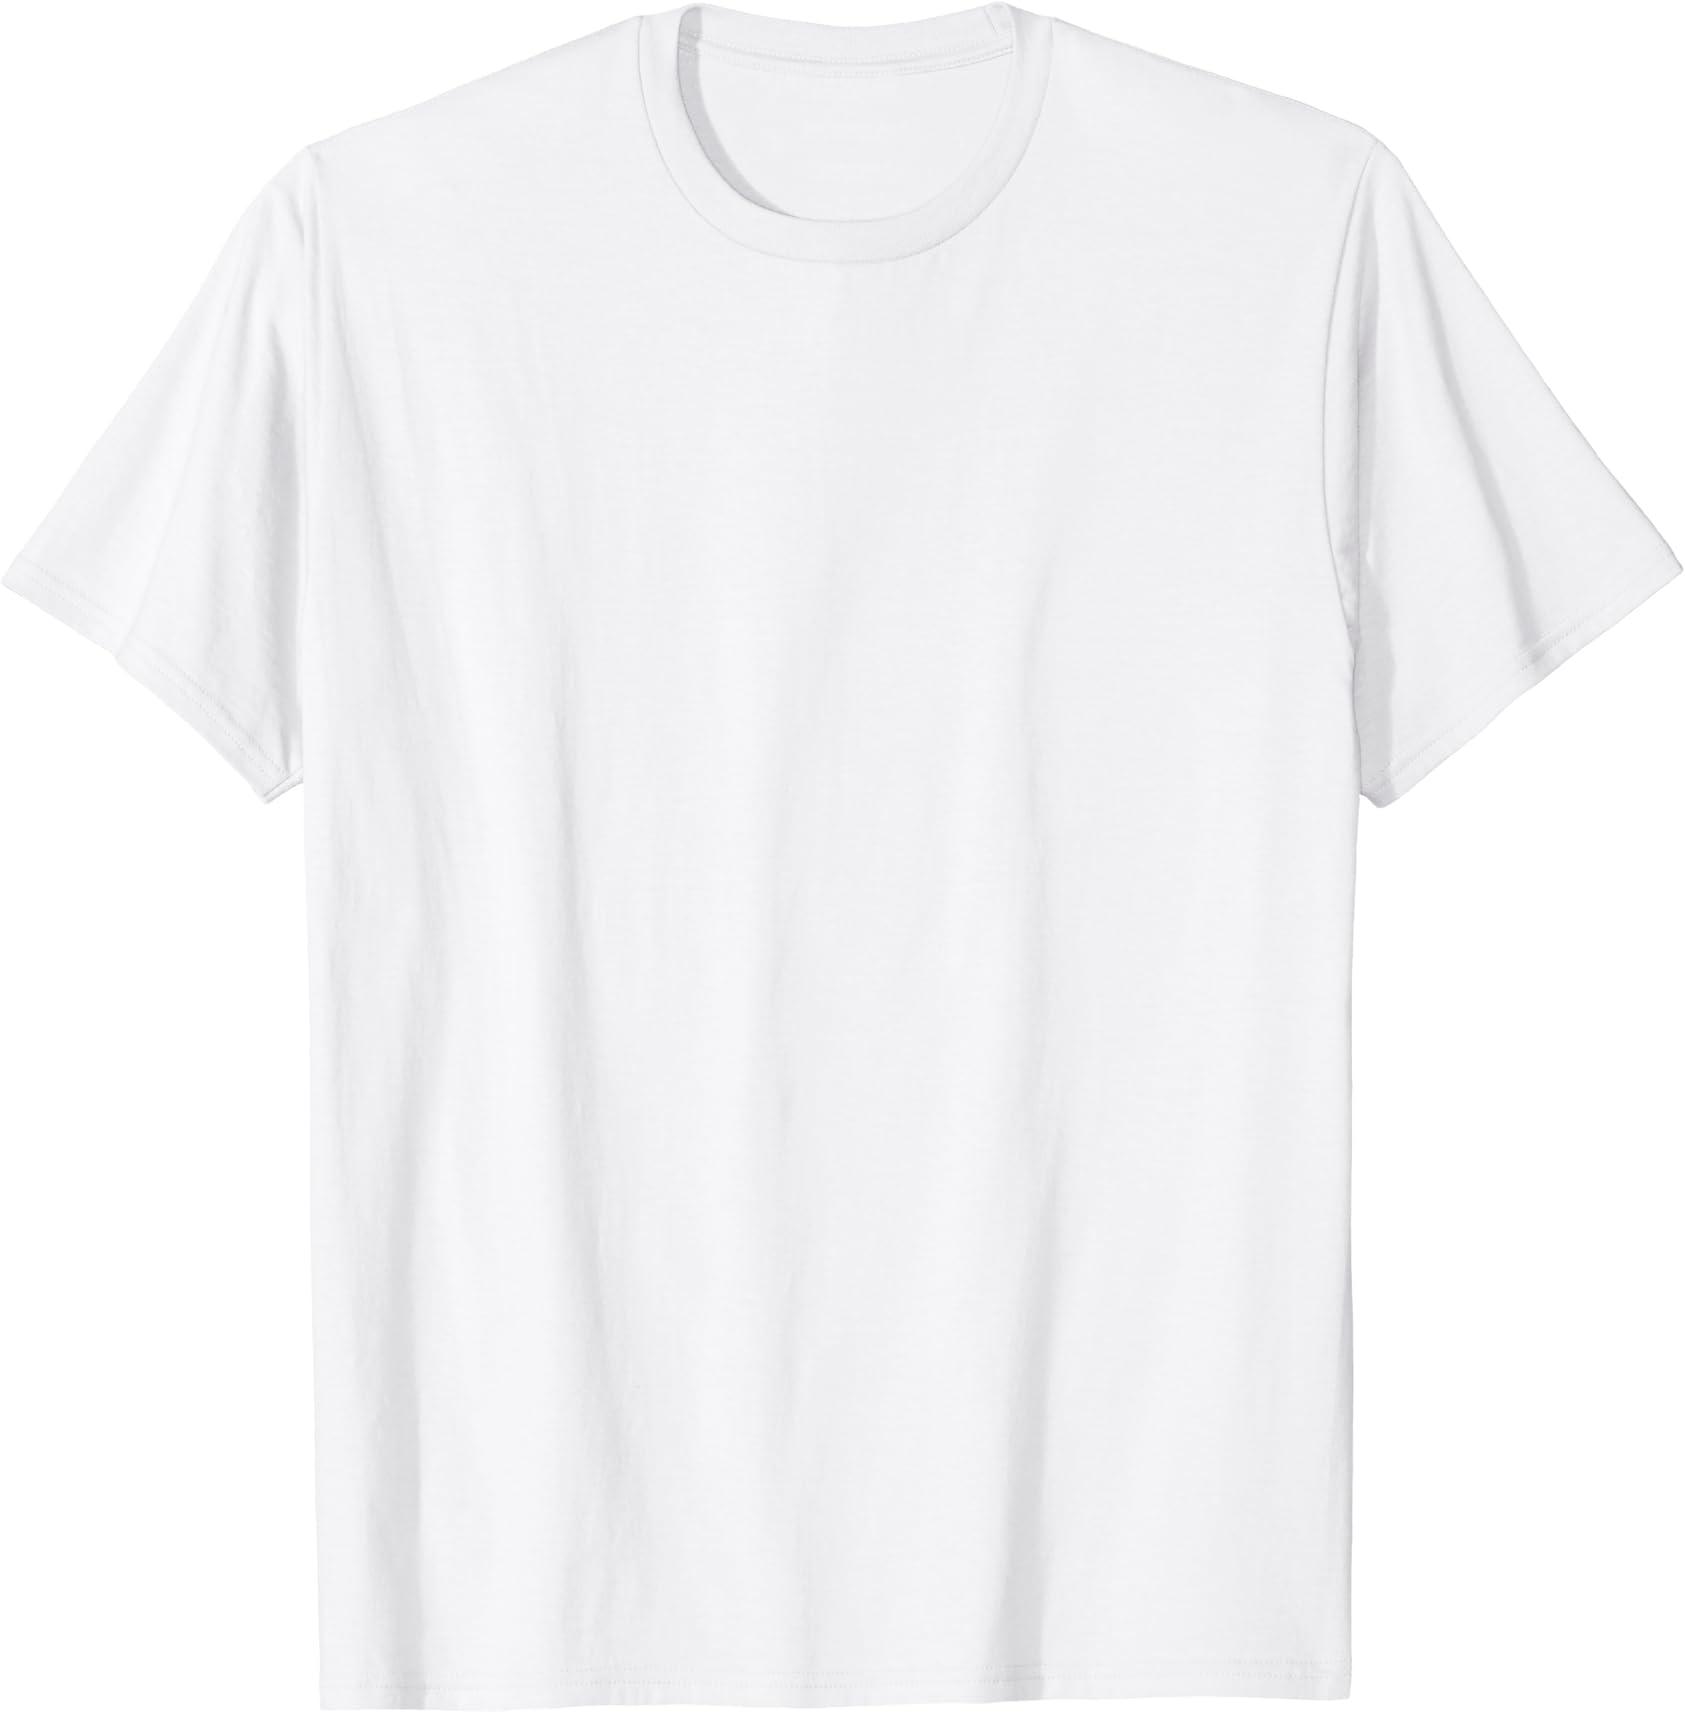 Niñas Niños Oficial Minions Despicable Me Blanco Manga Corta T Camiseta Top